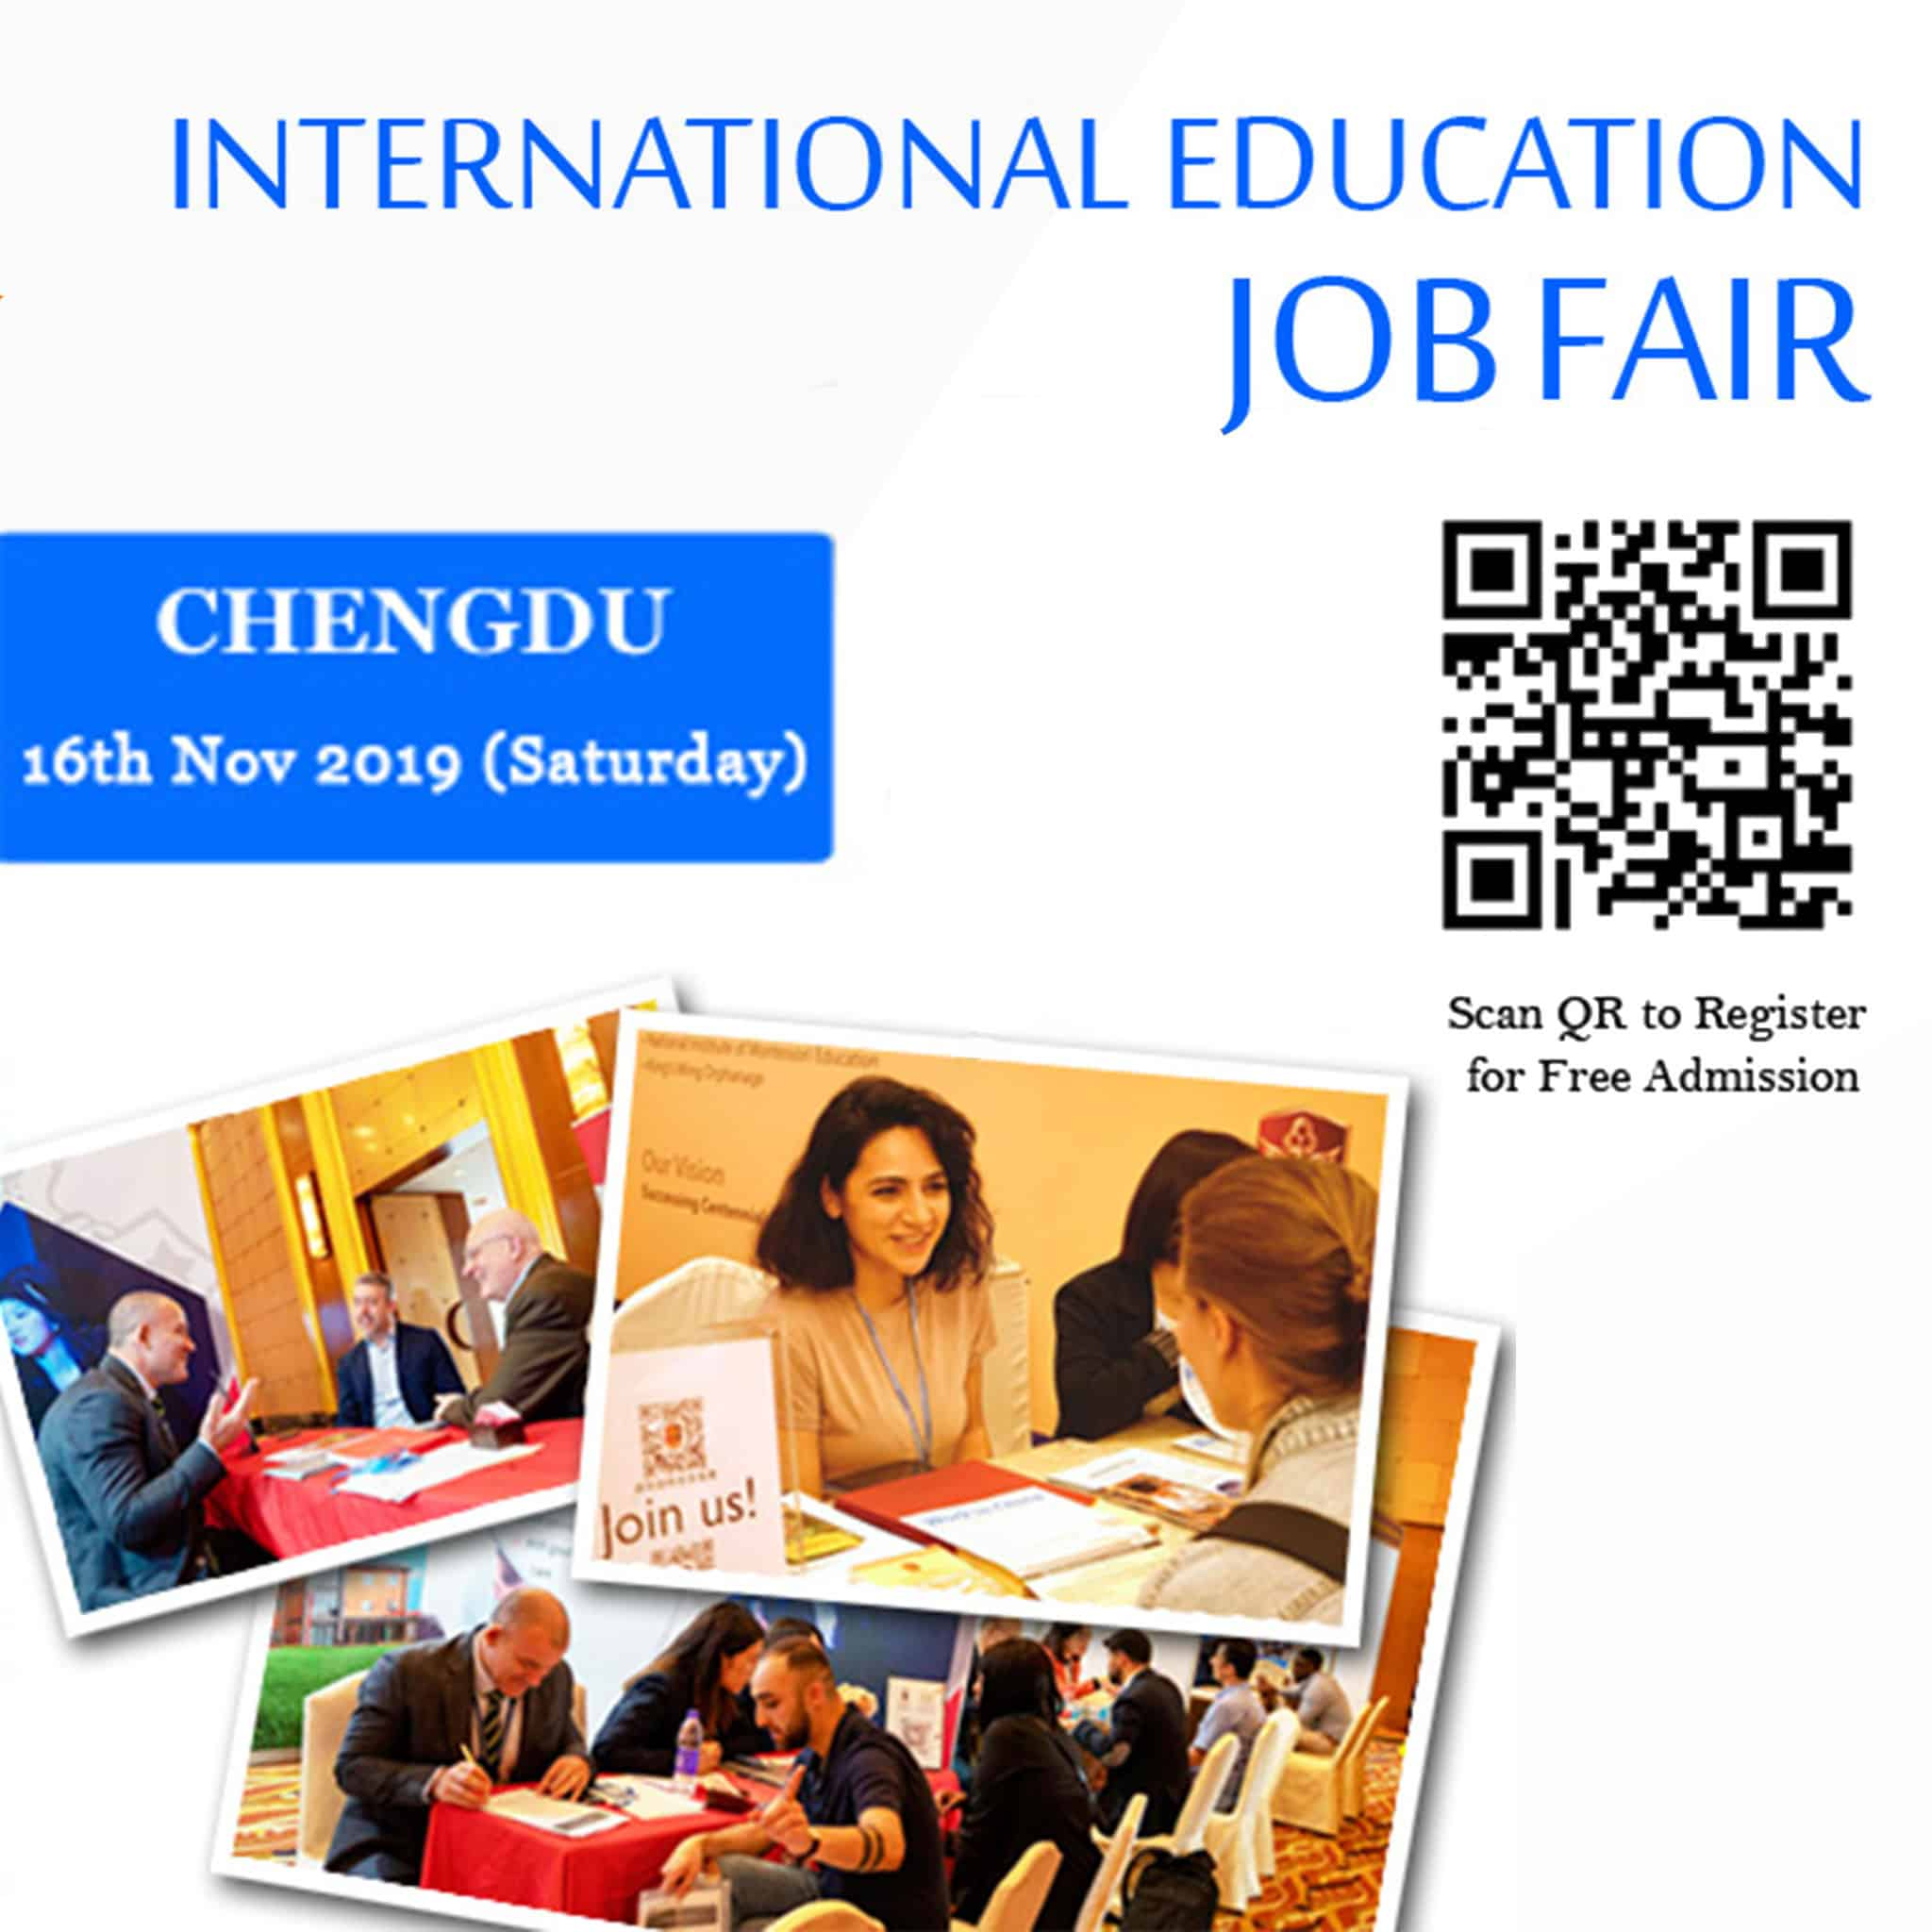 International Job Fair | Chengdu Expat